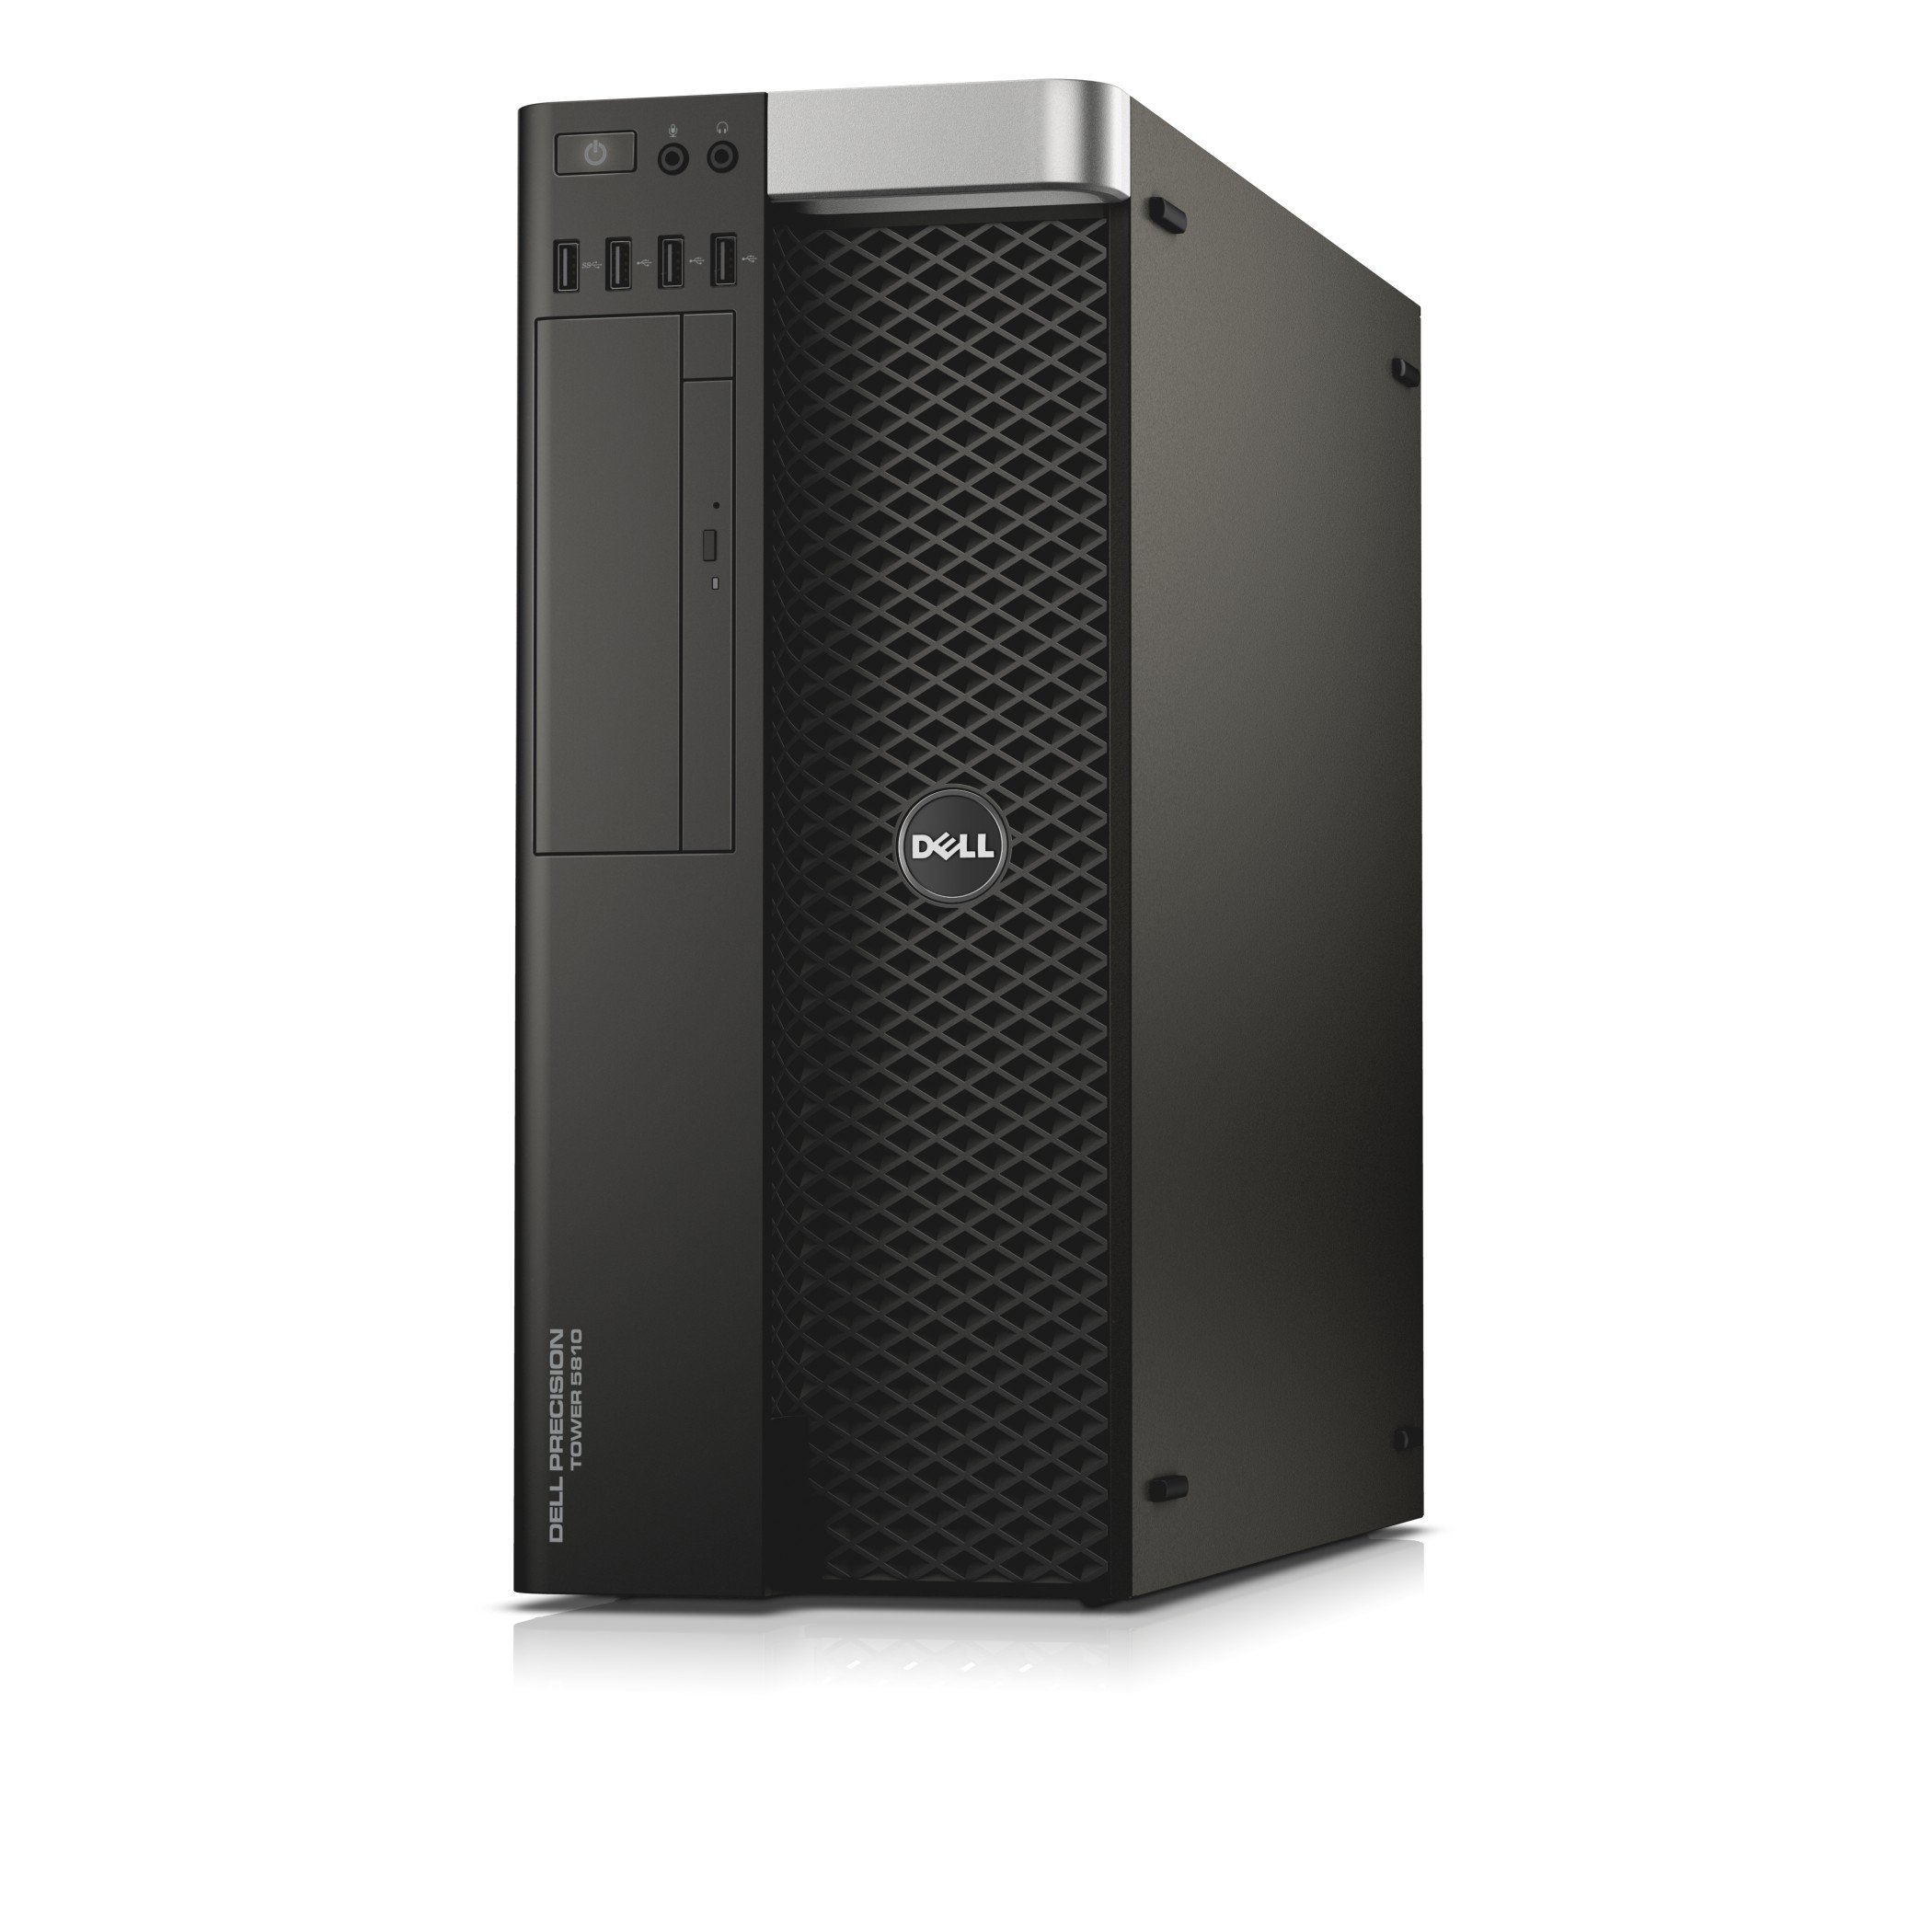 Dell Precision T5810 Workstation Desktop Computer, Intel E5-1650 v4, 32GB DDR4, 1TB Hard Drive, Windows 10 Pro PRT5810-1093